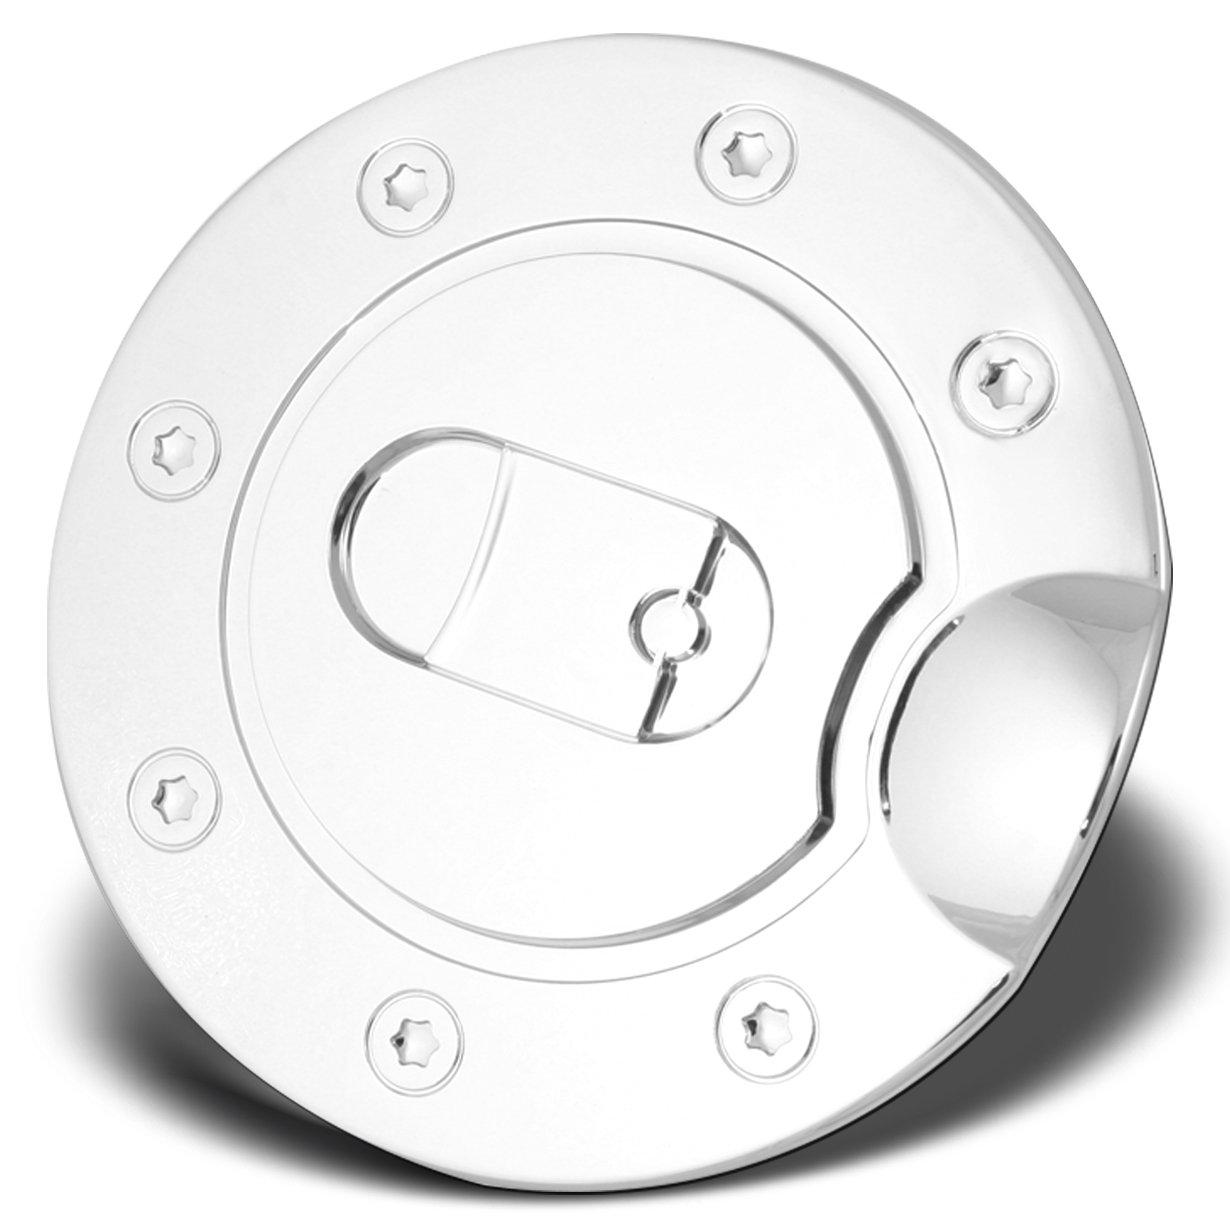 10-17 Dodge Ram 2500 3500 AutoModZone Chrome ABS Fuel Tank Gas Door Cap Cover for 09-17 Dodge Ram 1500